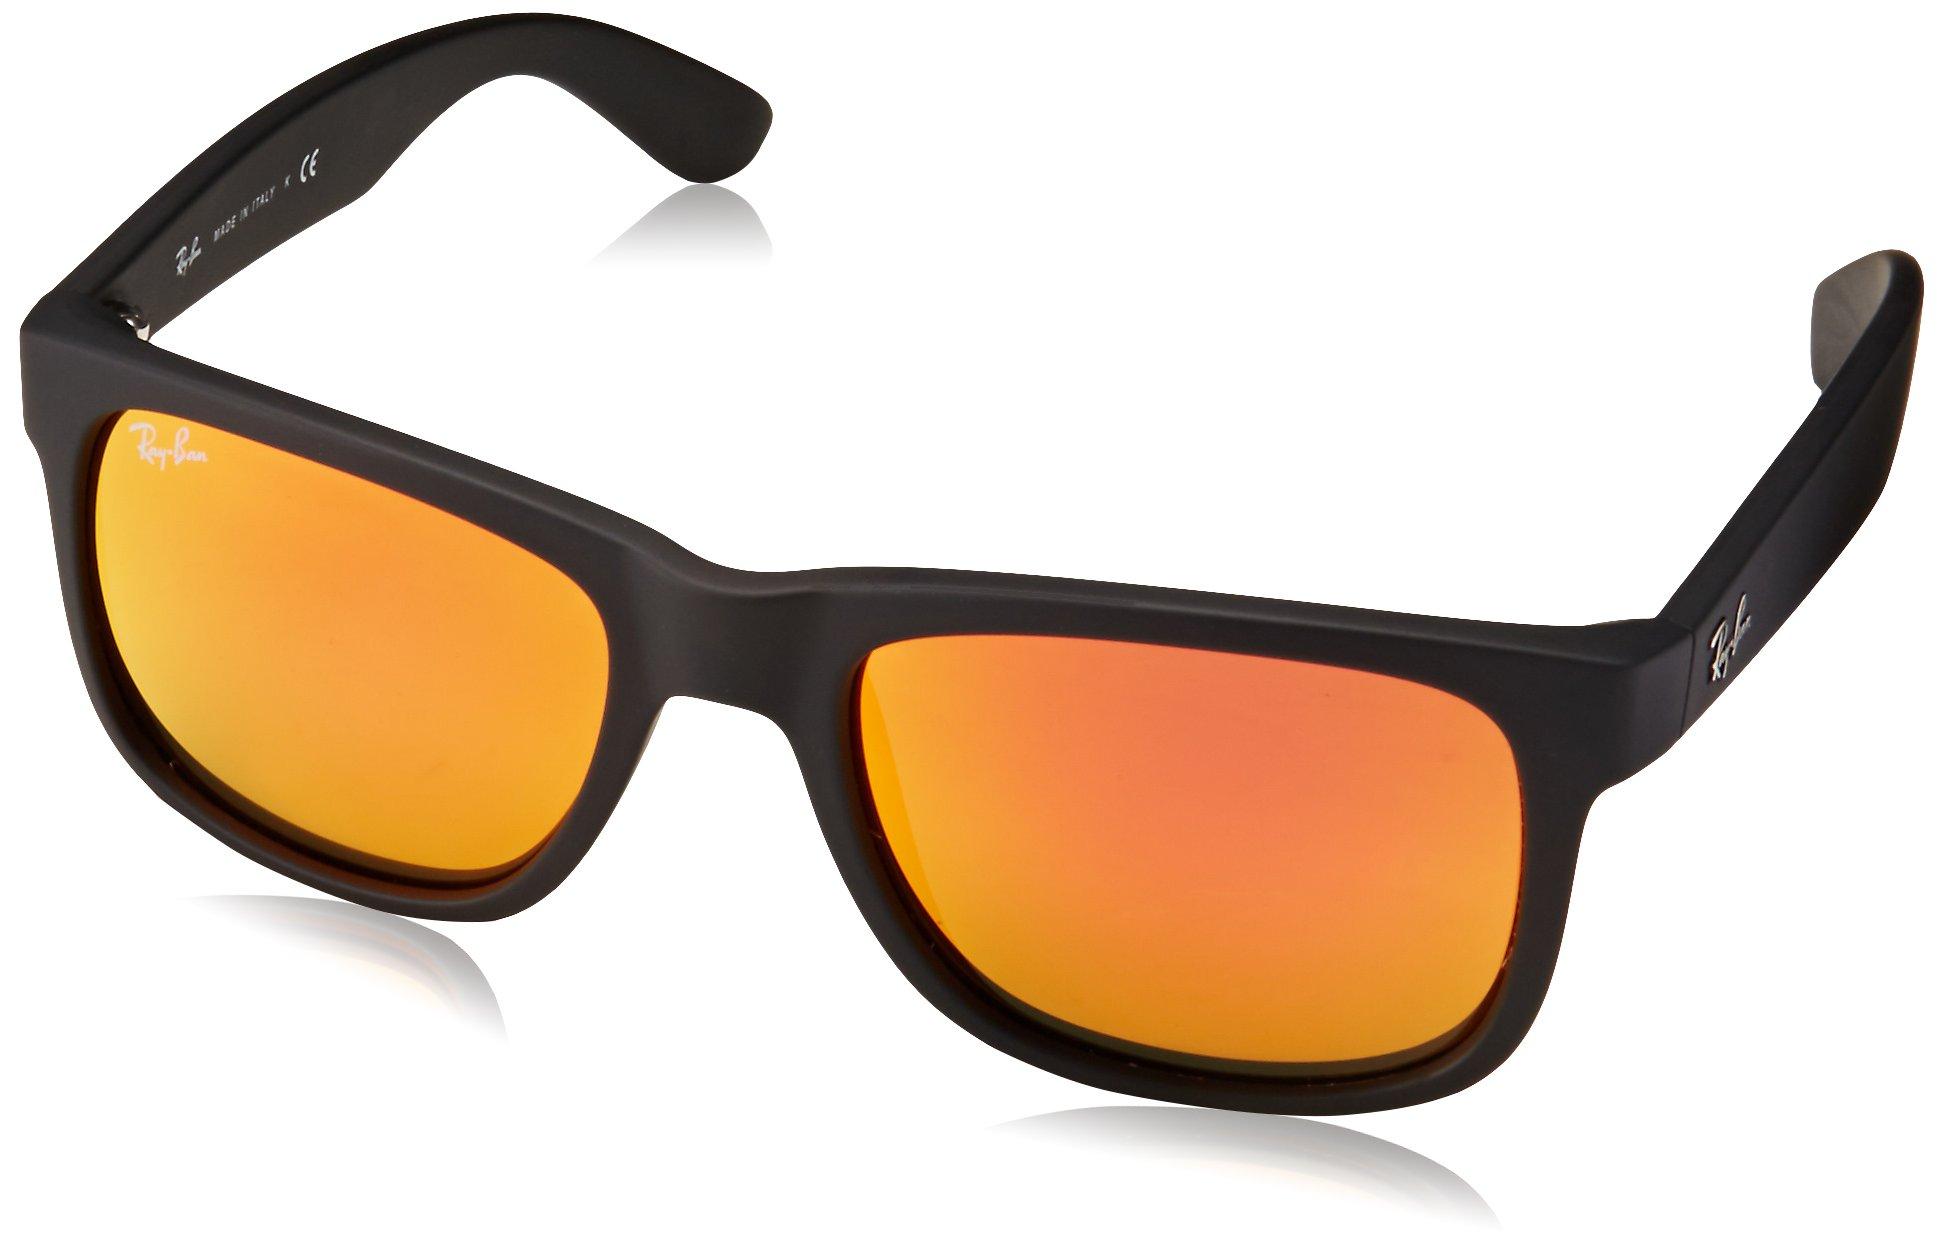 0d2067ab67 Get Quotations · Ray-Ban 0RB4165 Wayfarer Sunglasses